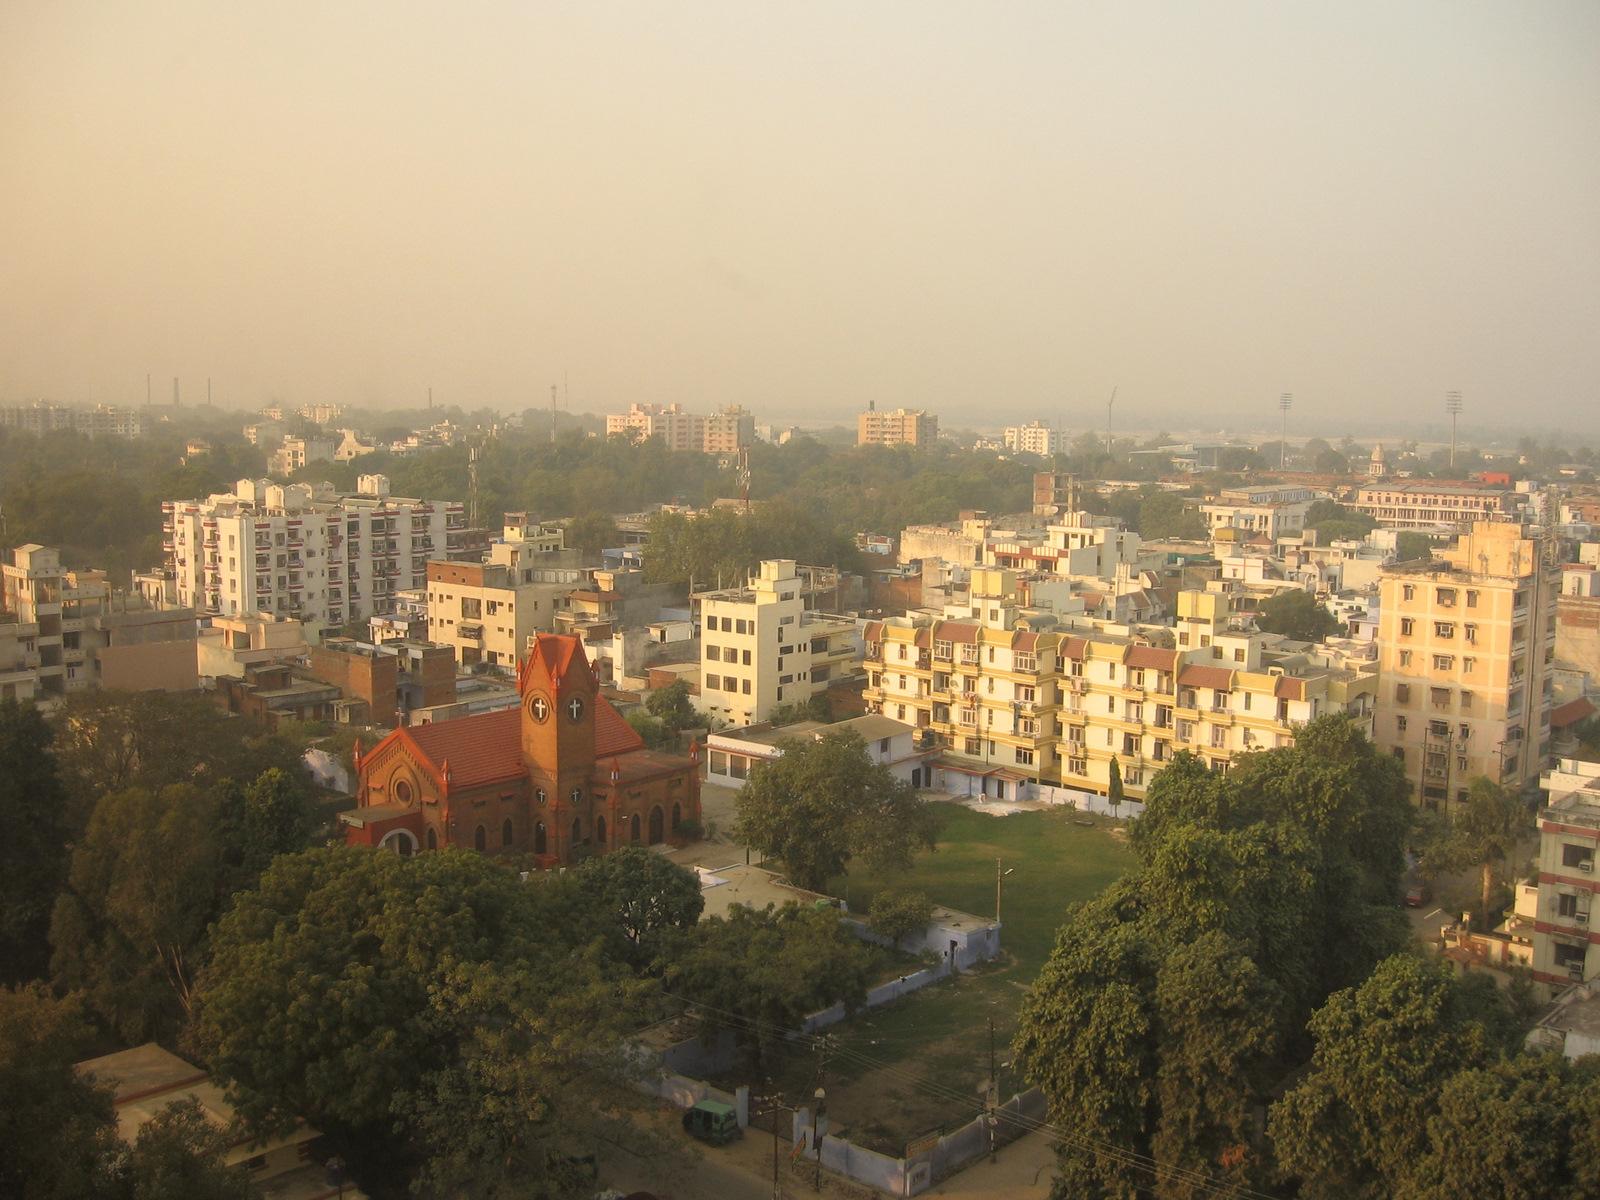 Kanpur, India